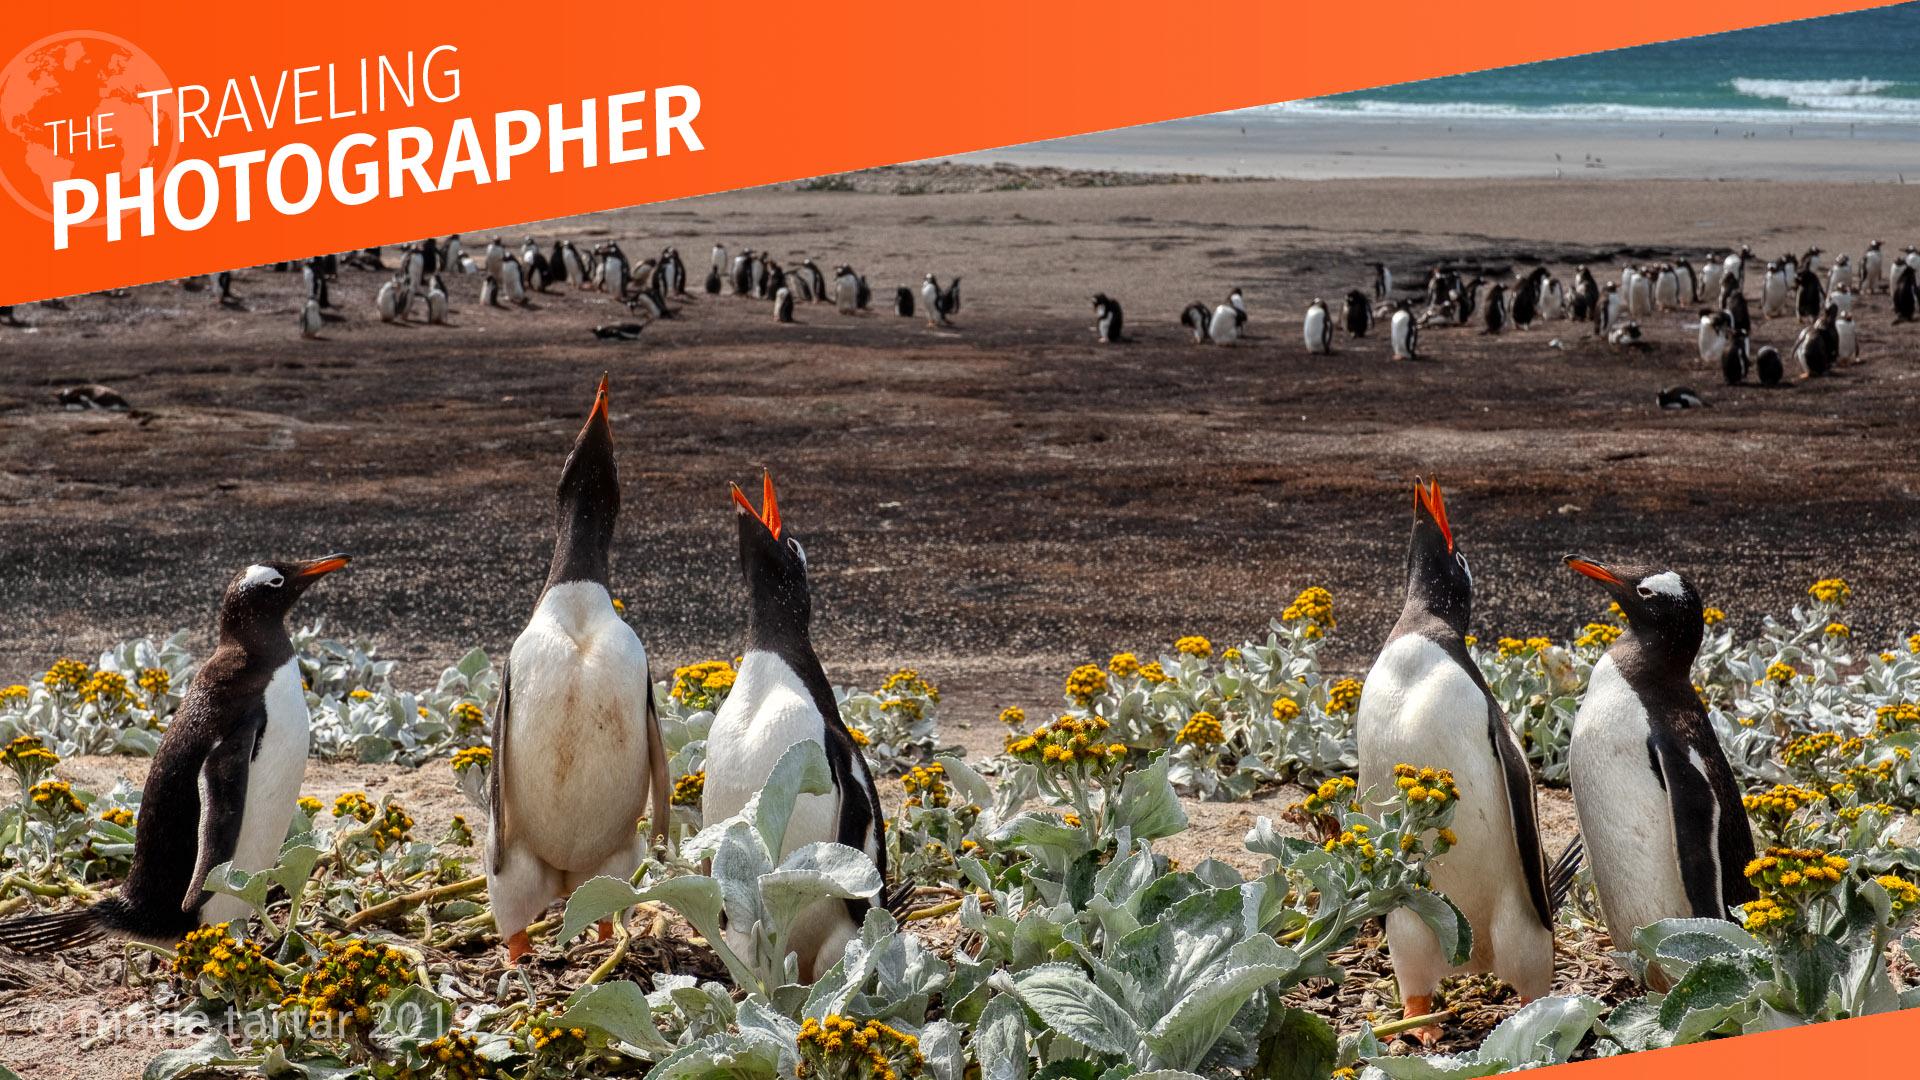 The Traveling Photographer: Choosing a trip to Antarctica, Part 2 | Photofocus